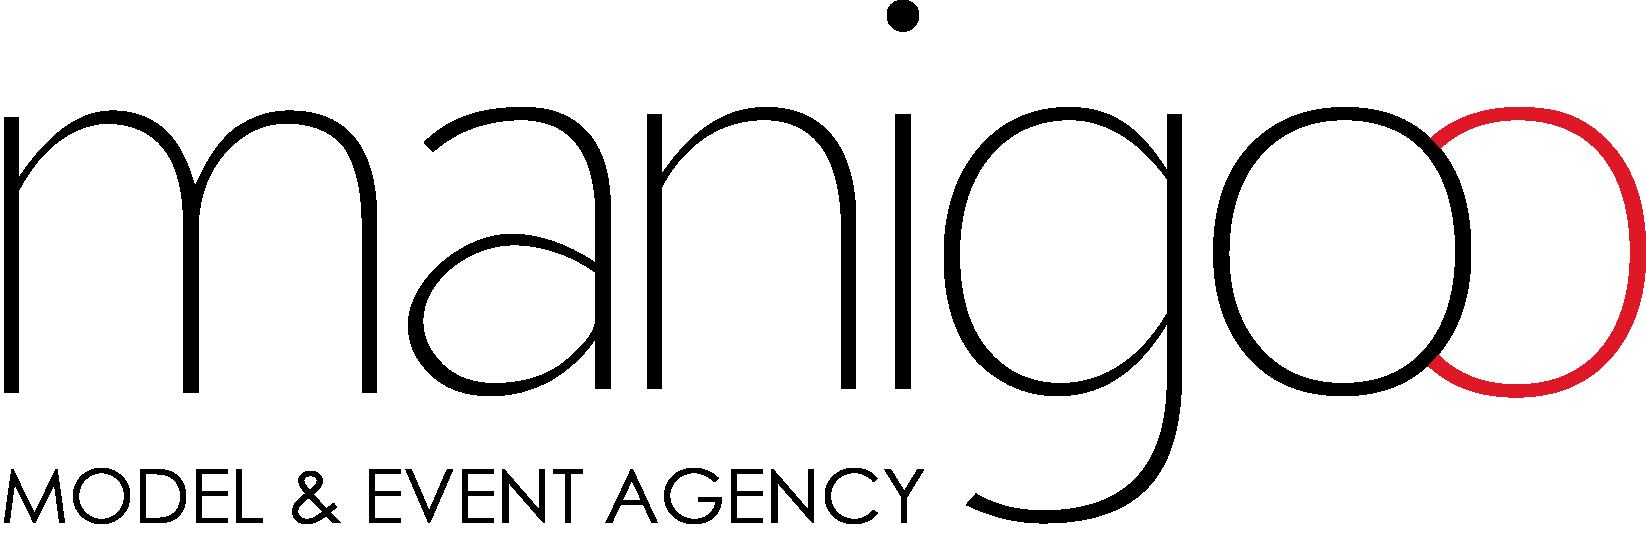 Manigoo